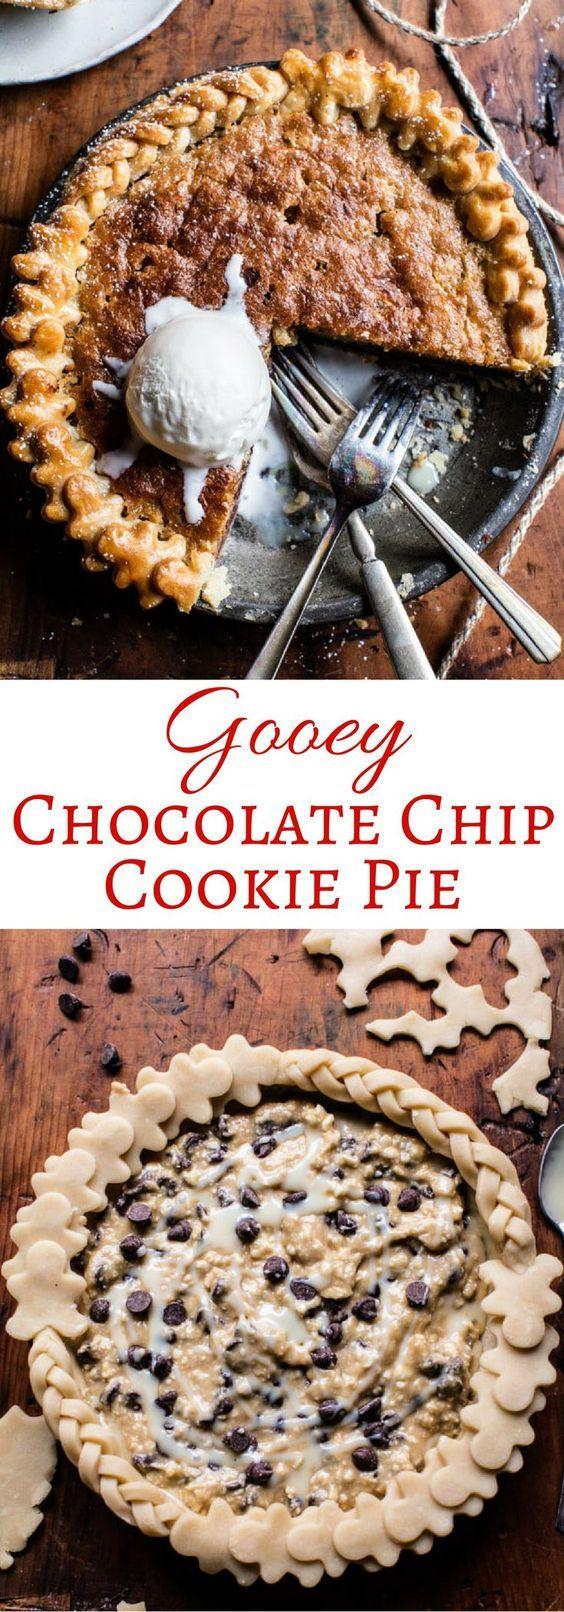 Gooey Chocolate Chip Cookie Pie   halfbakedharvest.com @hbharvest